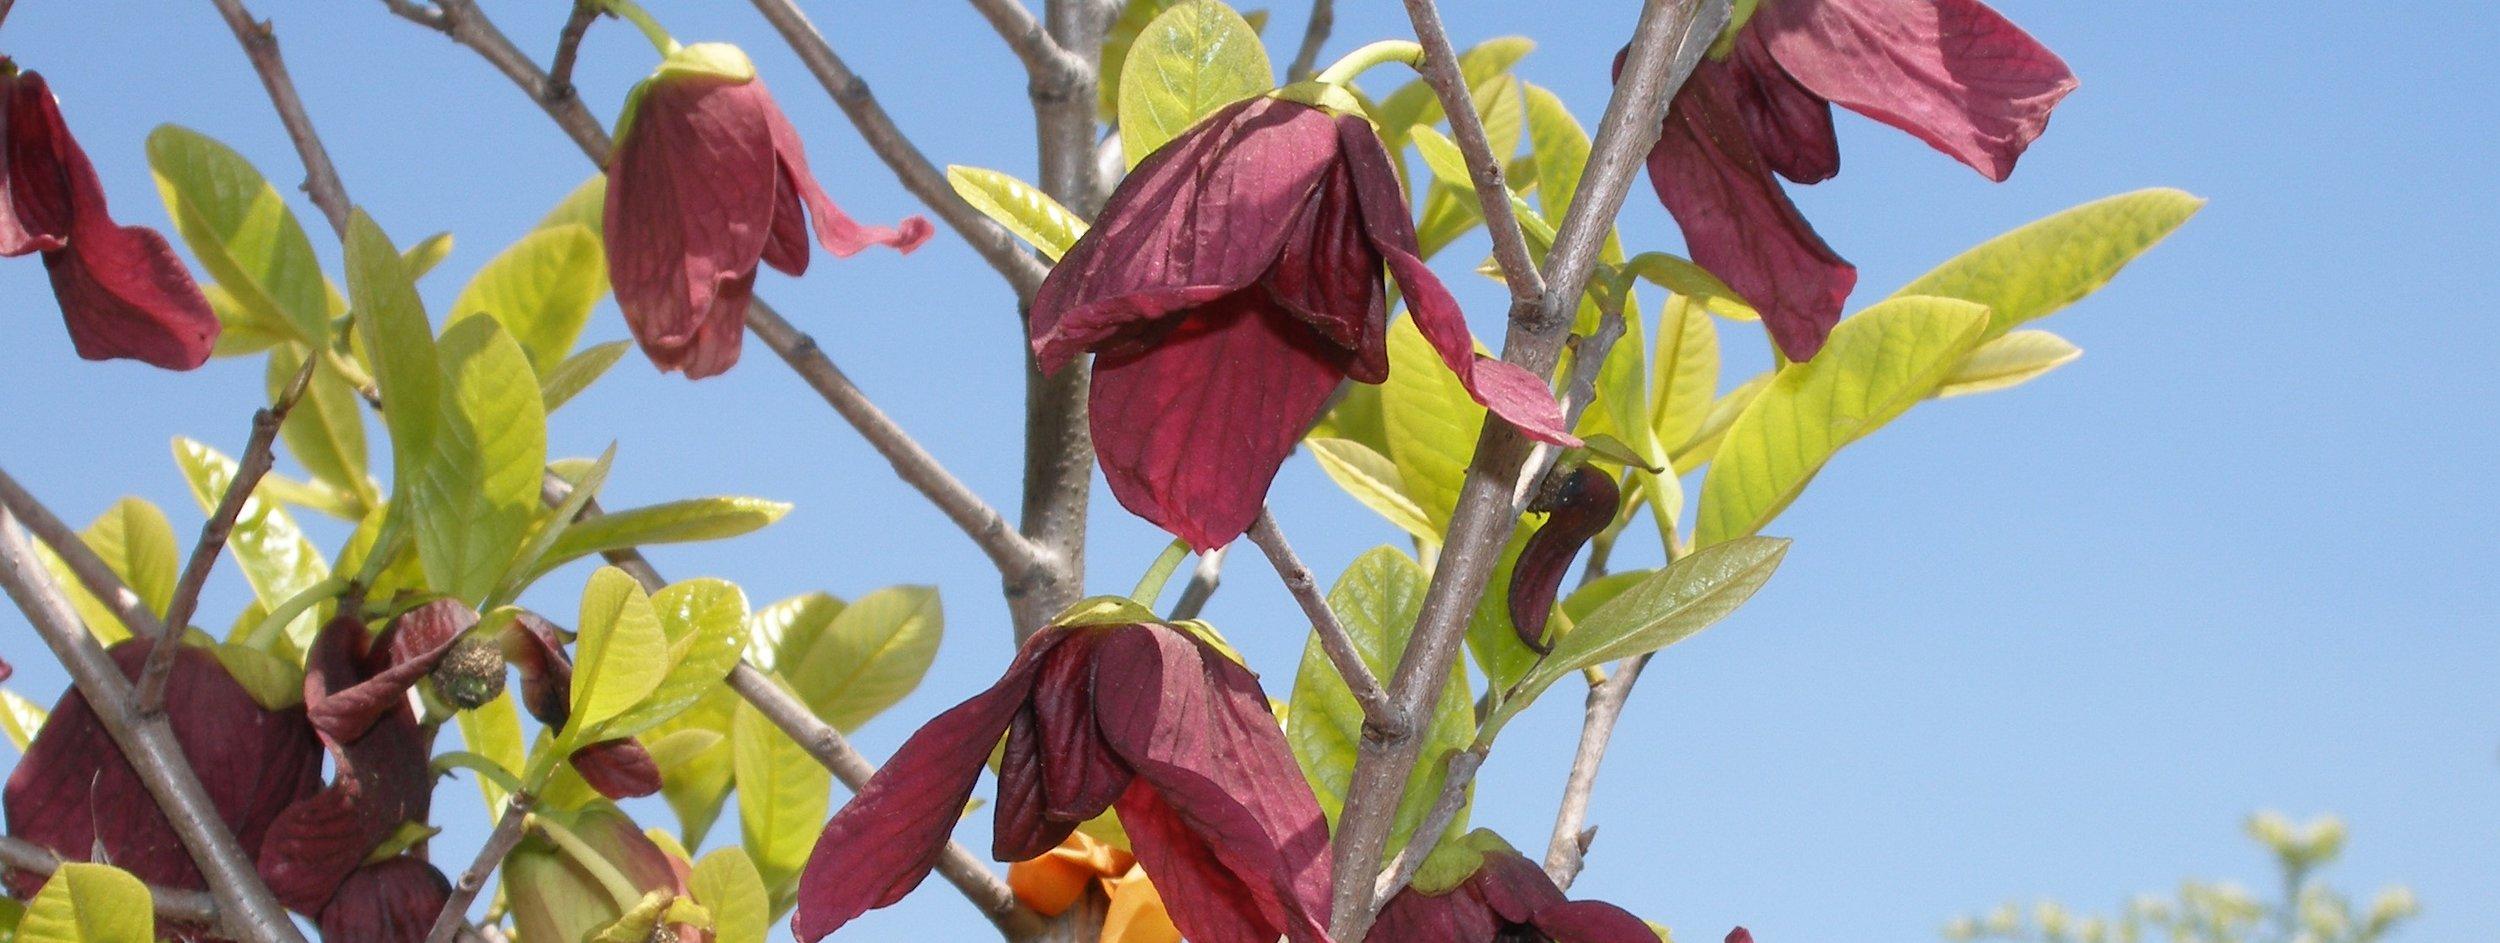 Hybrid pawpaw flowers  2.jpg